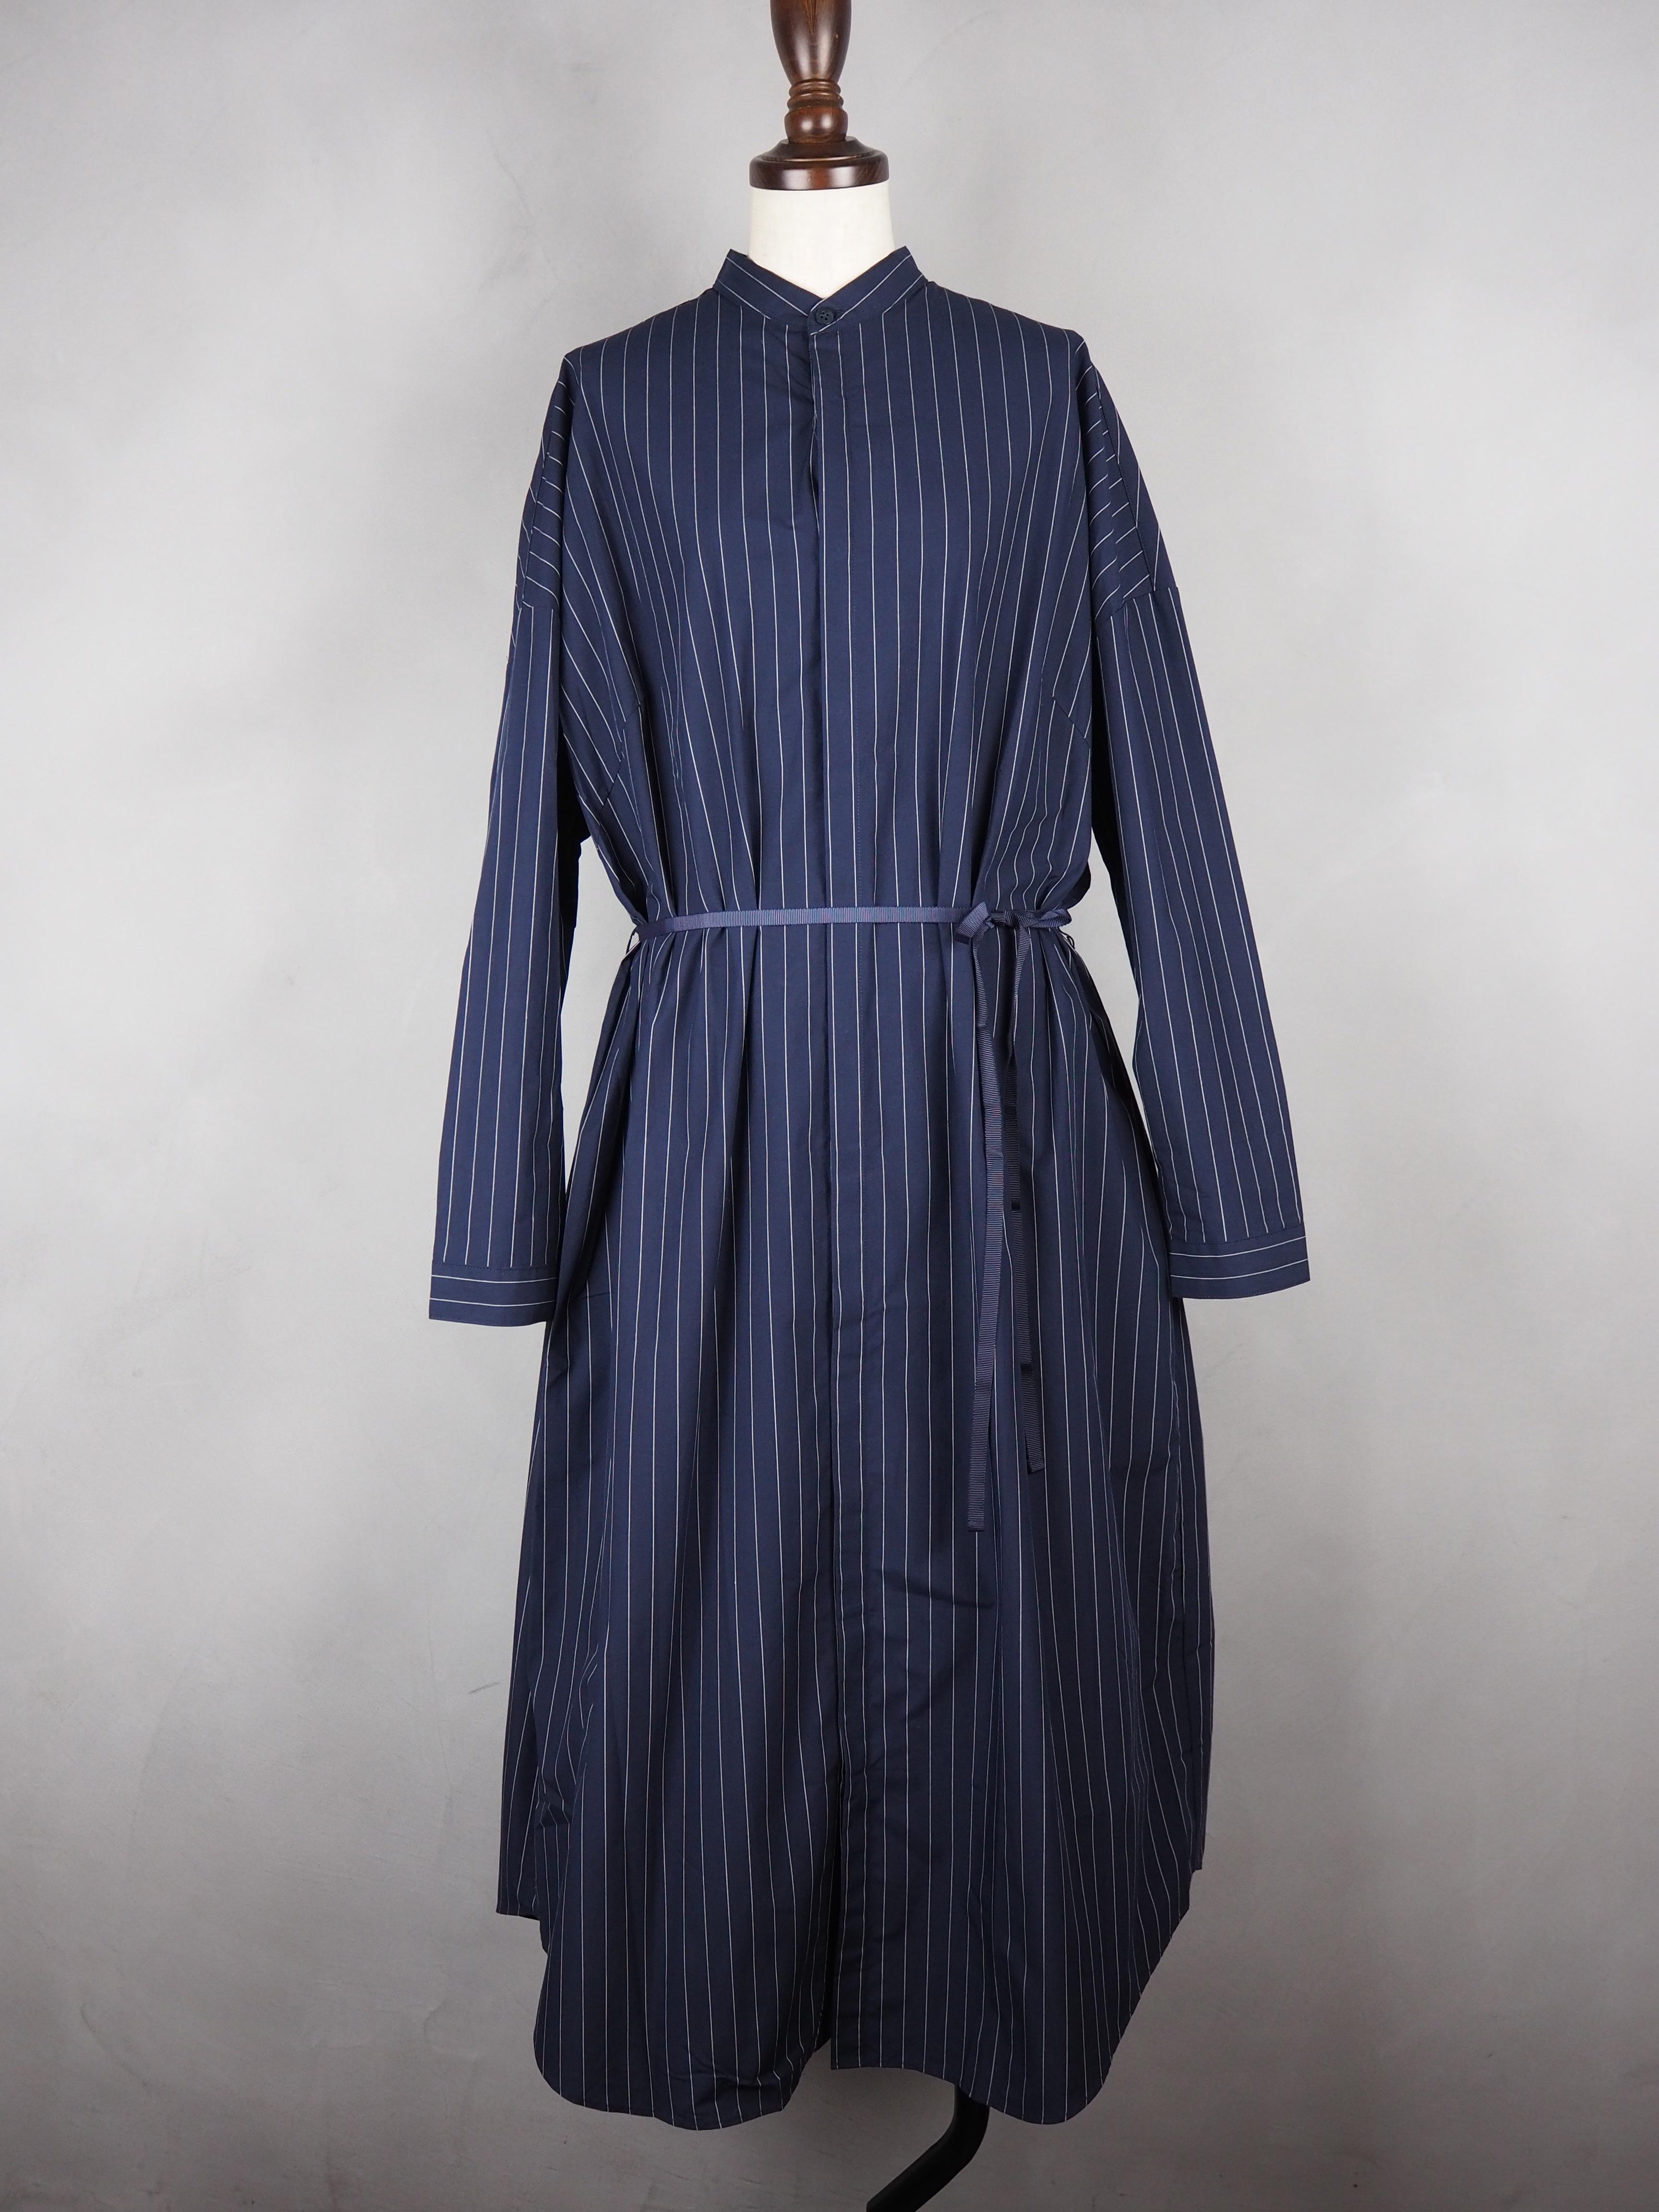 【MANON】BAND COLLAR SHIRT COAT